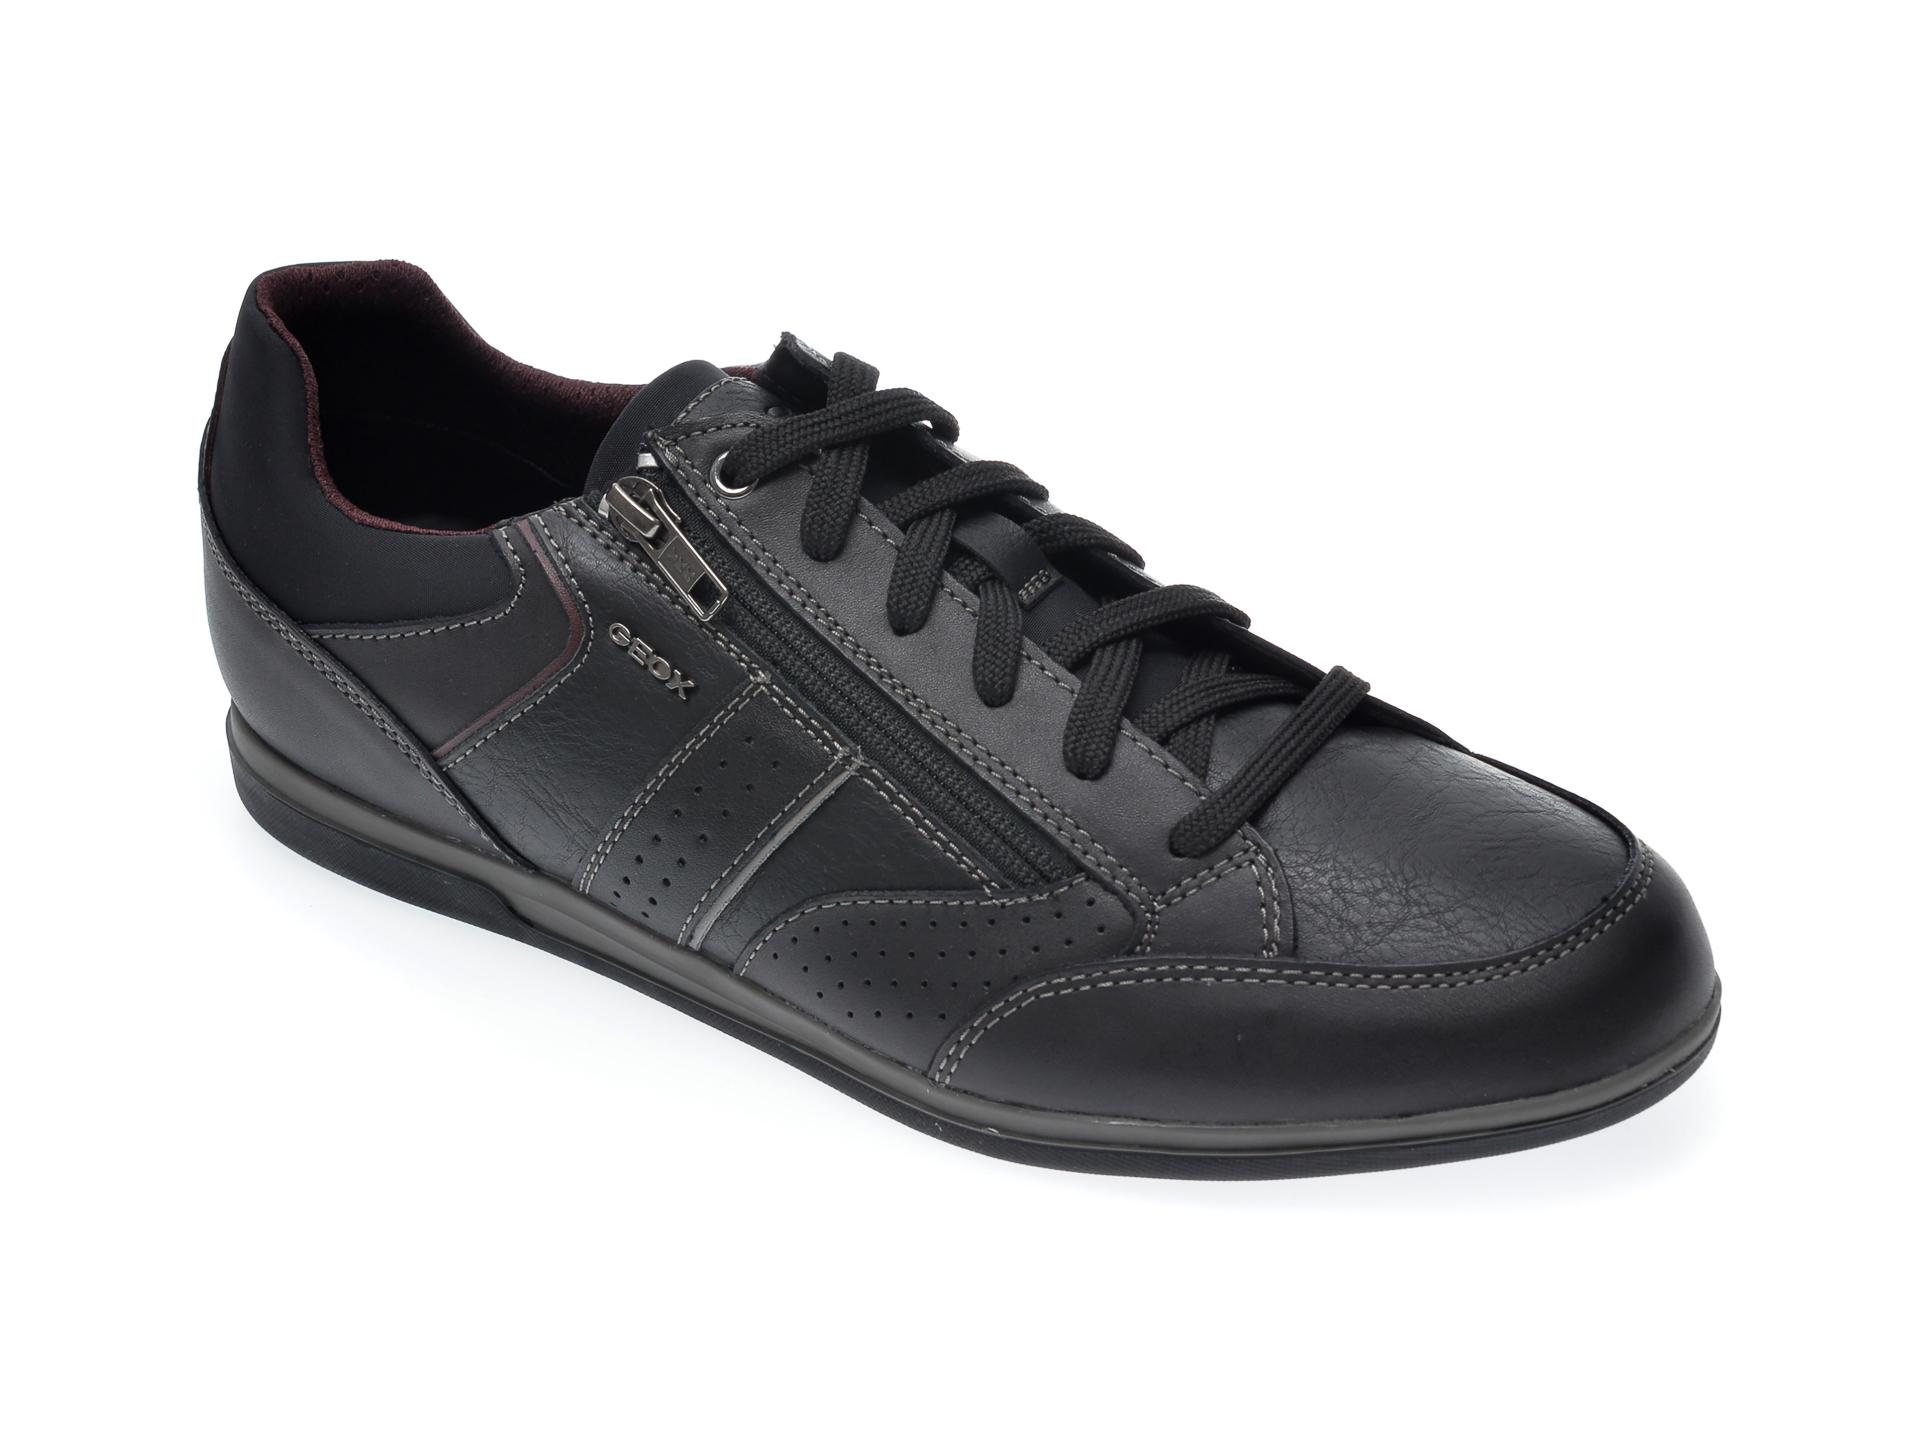 Pantofi GEOX negri, U024GA, din piele ecologica